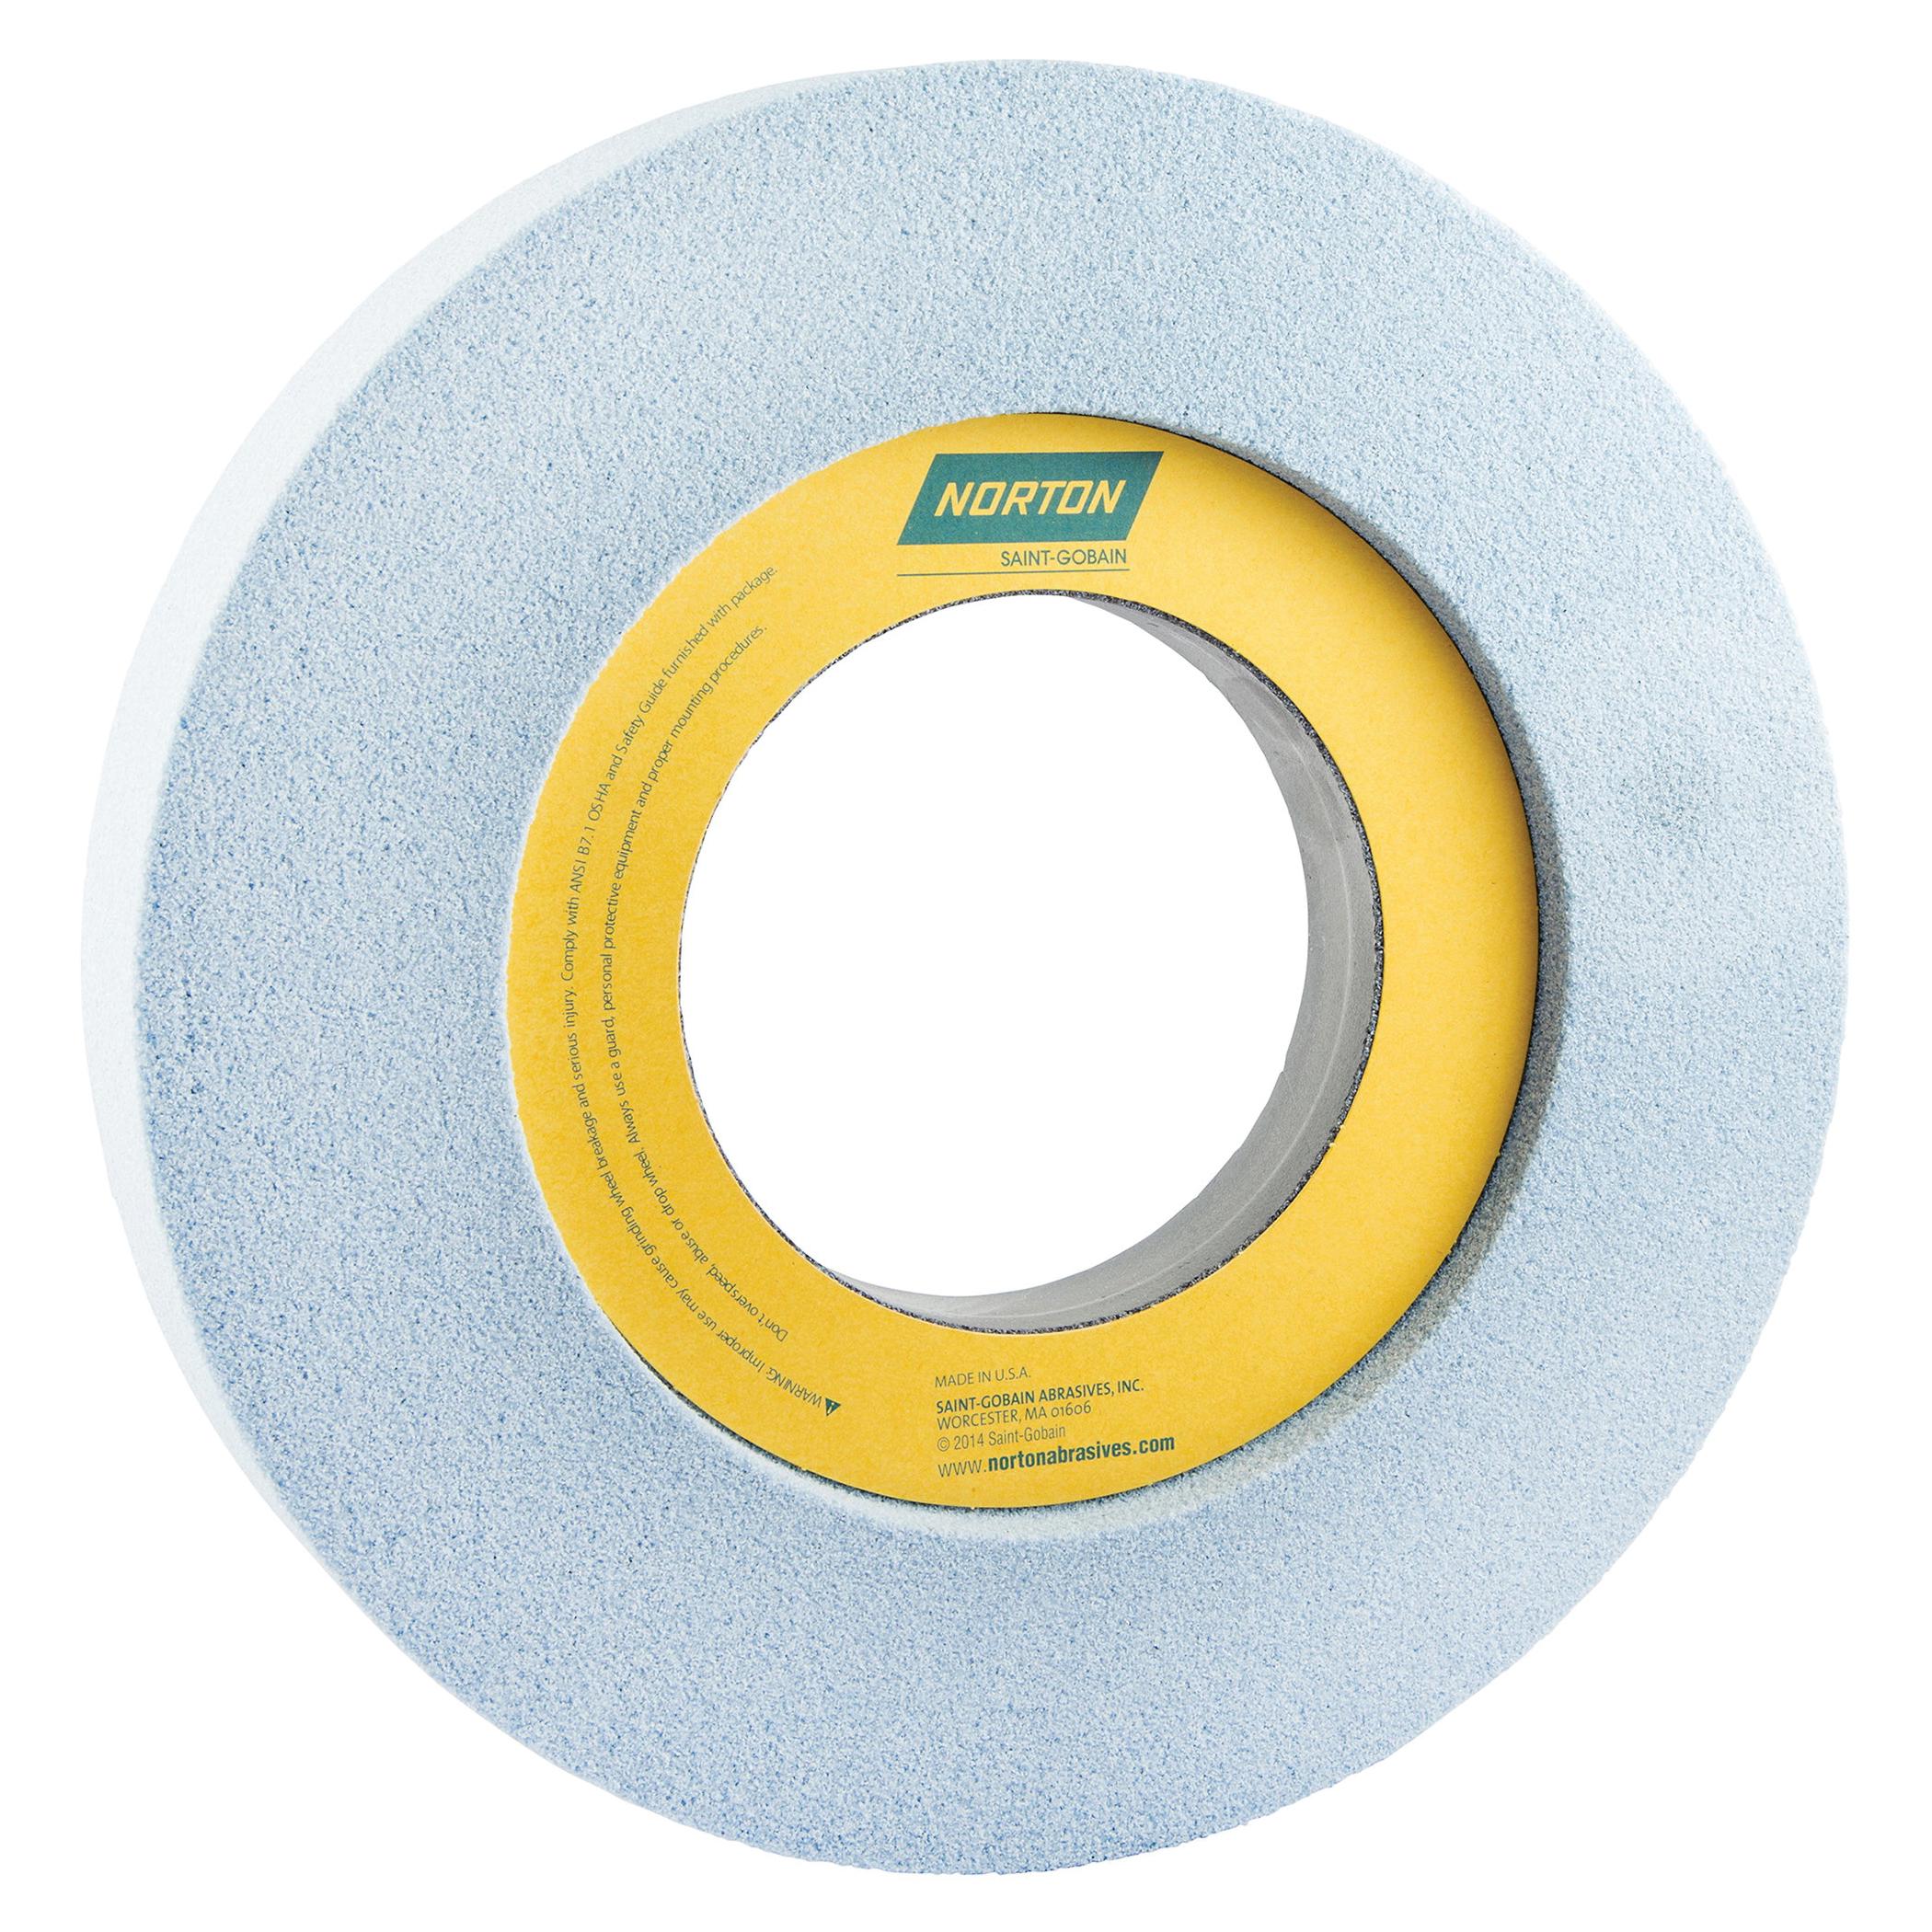 Norton® 66253202883 5SG 1-Side Recessed Toolroom Wheel, 12 in Dia x 1-1/2 in THK, 5 in Center Hole, 46 Grit, Ceramic Alumina/Friable Aluminum Oxide Abrasive